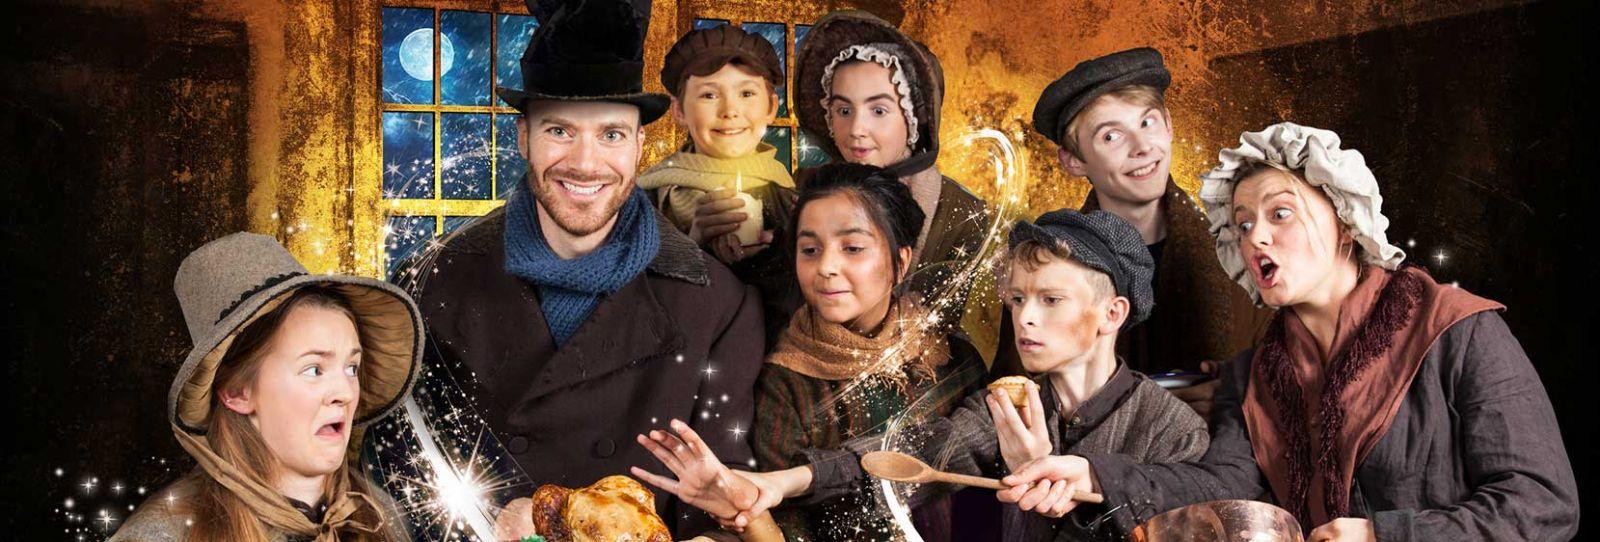 Meet the cast of A Christmas Carol